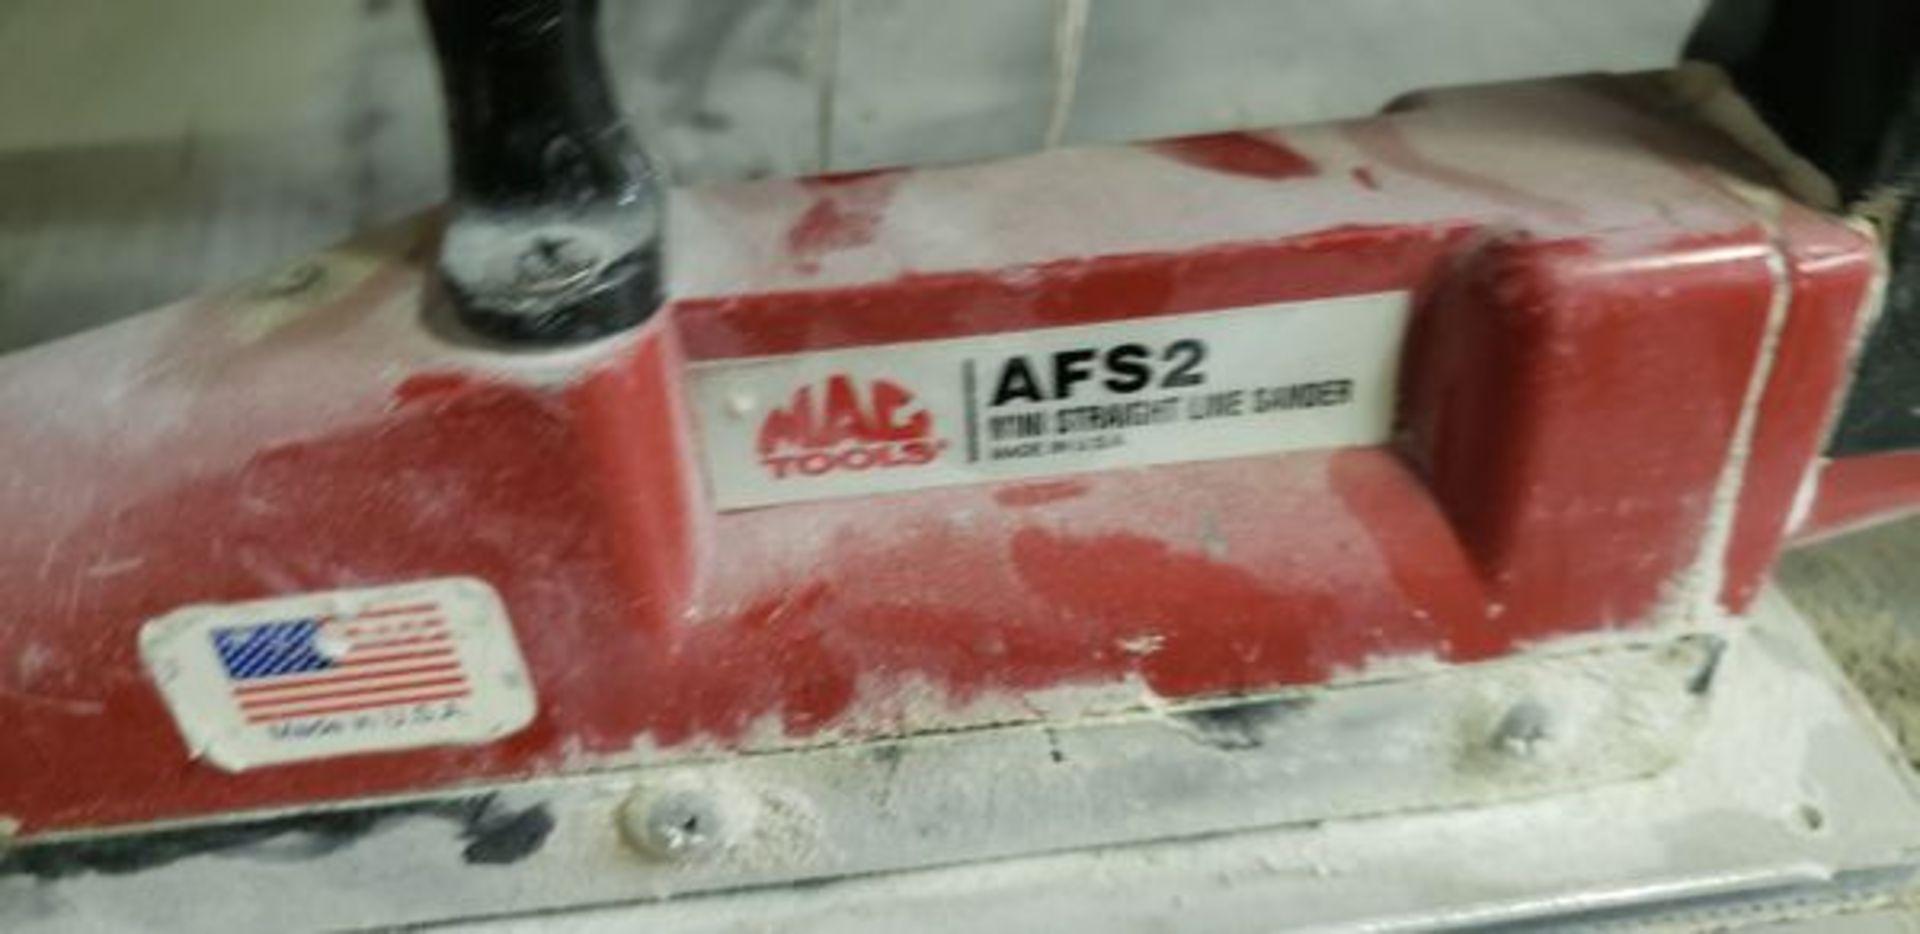 MAC AFS2 MINI STRAIGHT LINE SANDER - Image 2 of 2